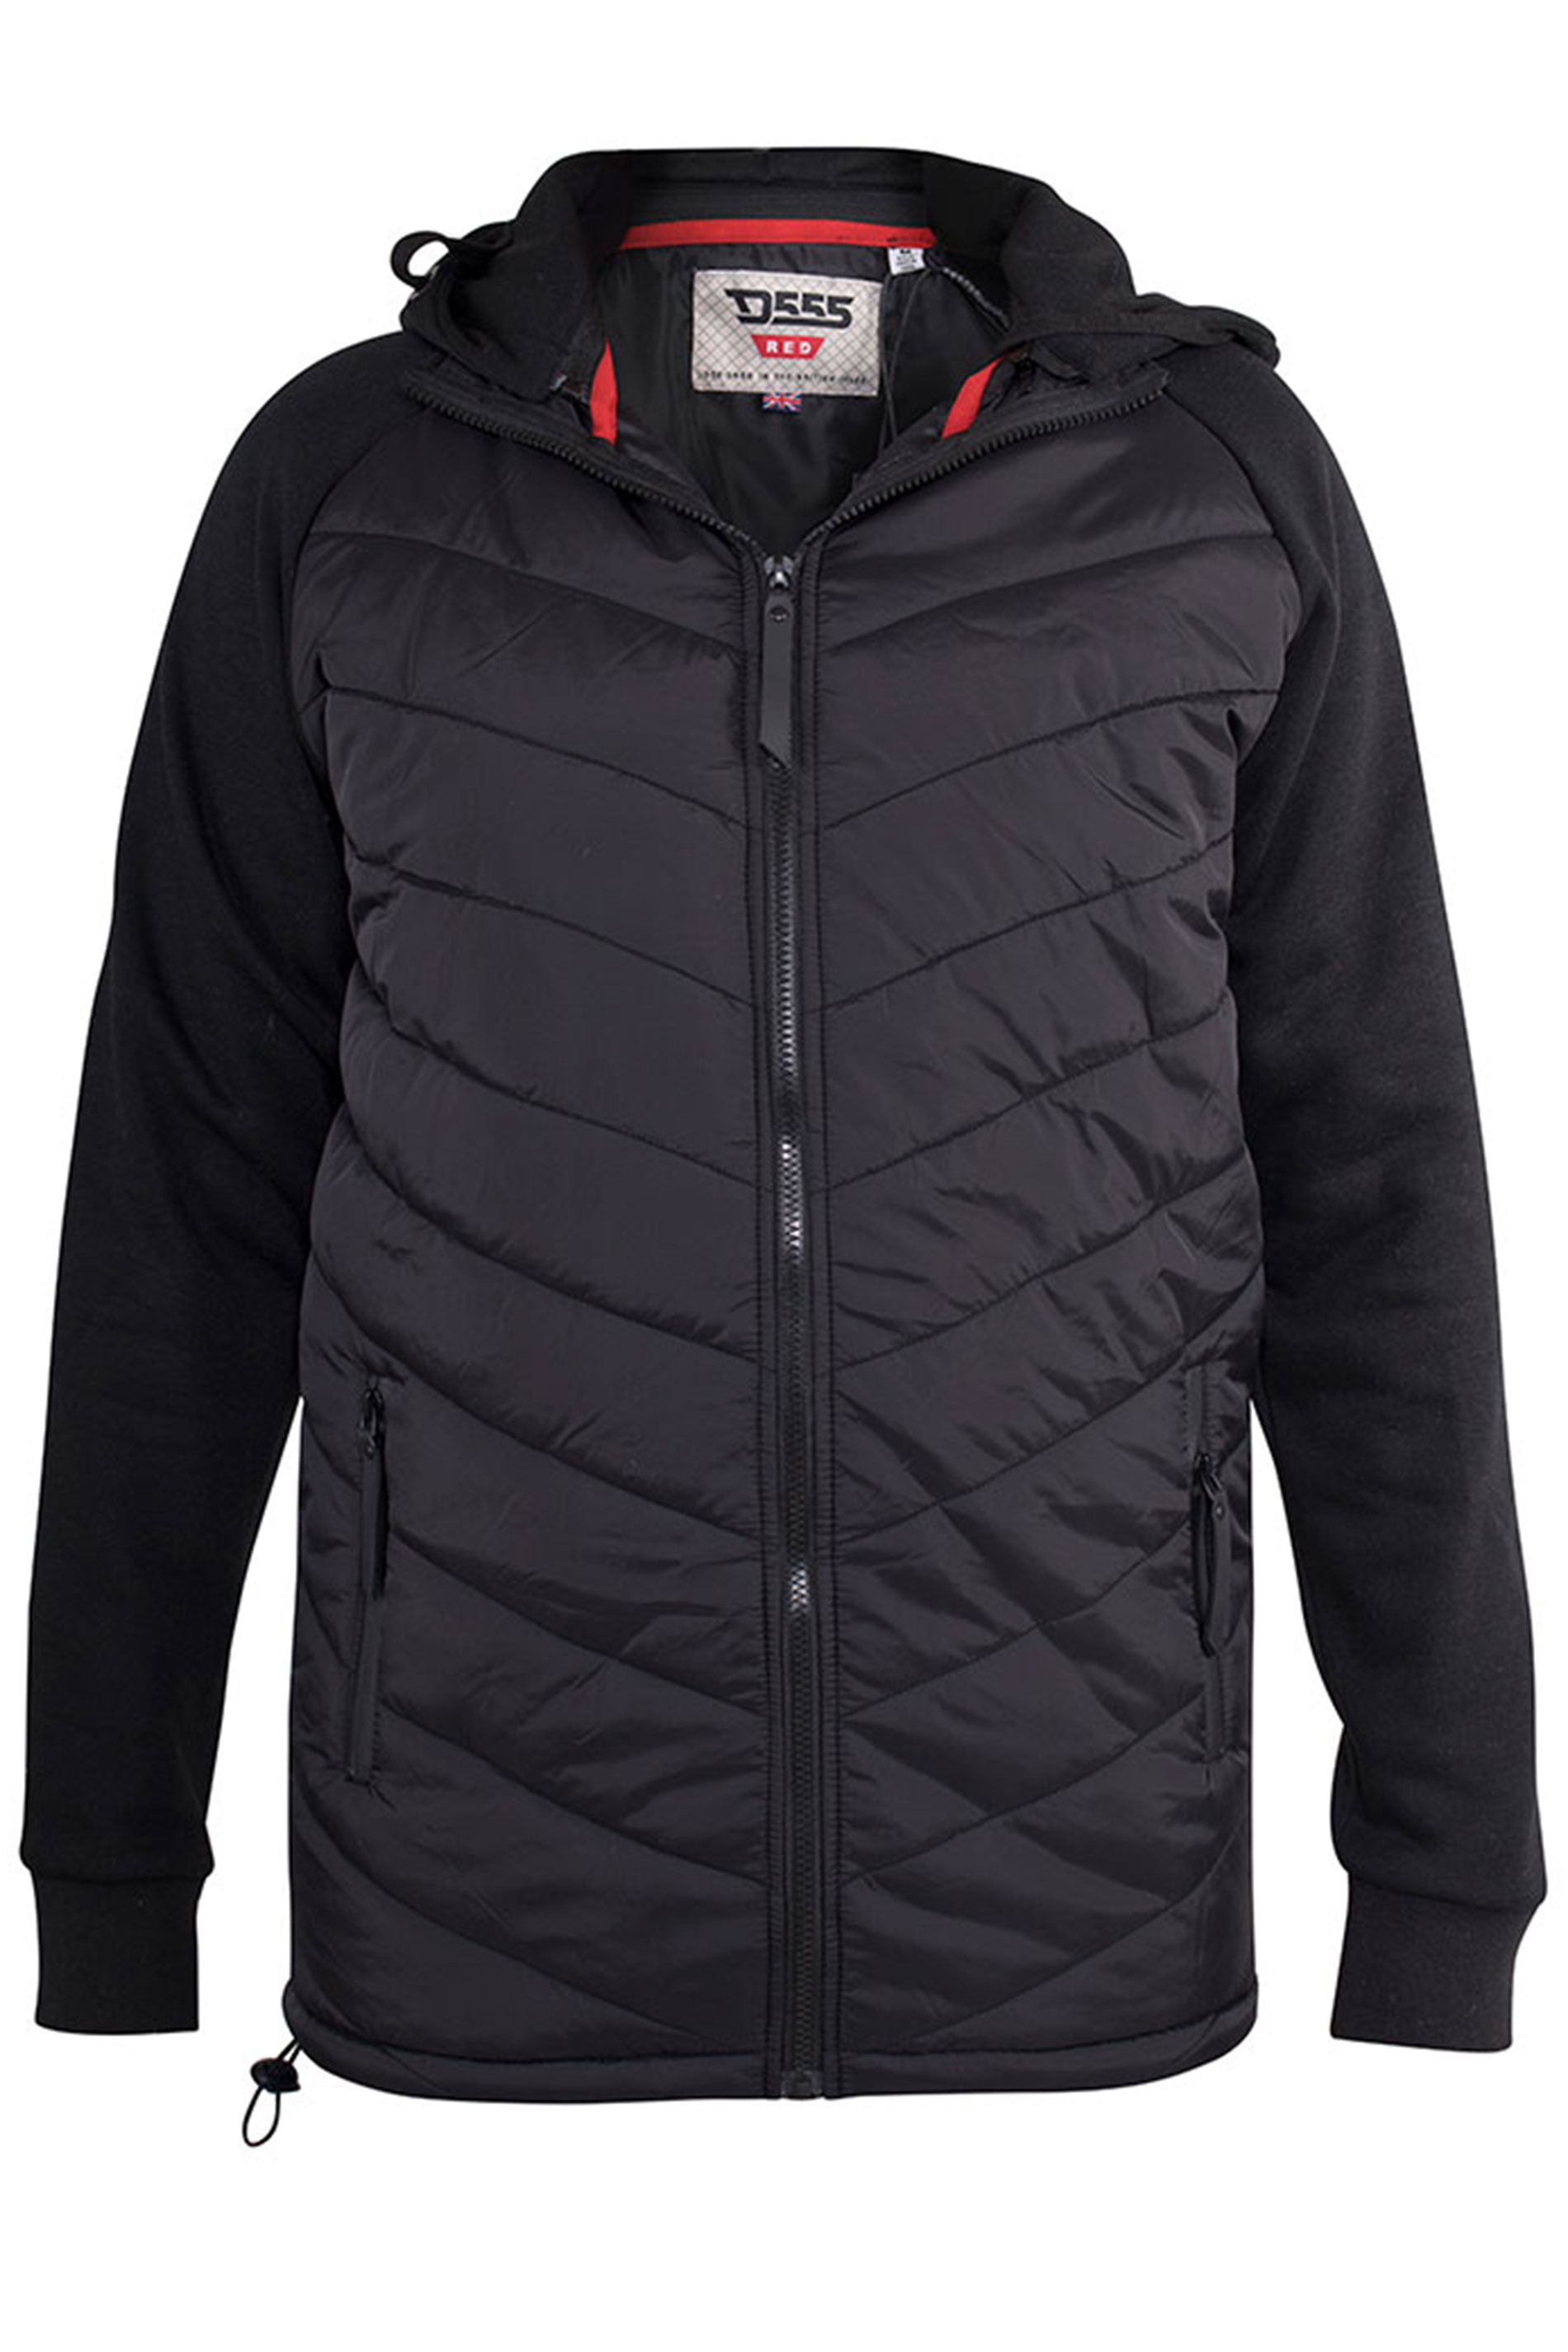 D555 Black Thorpe Quilted Jacket